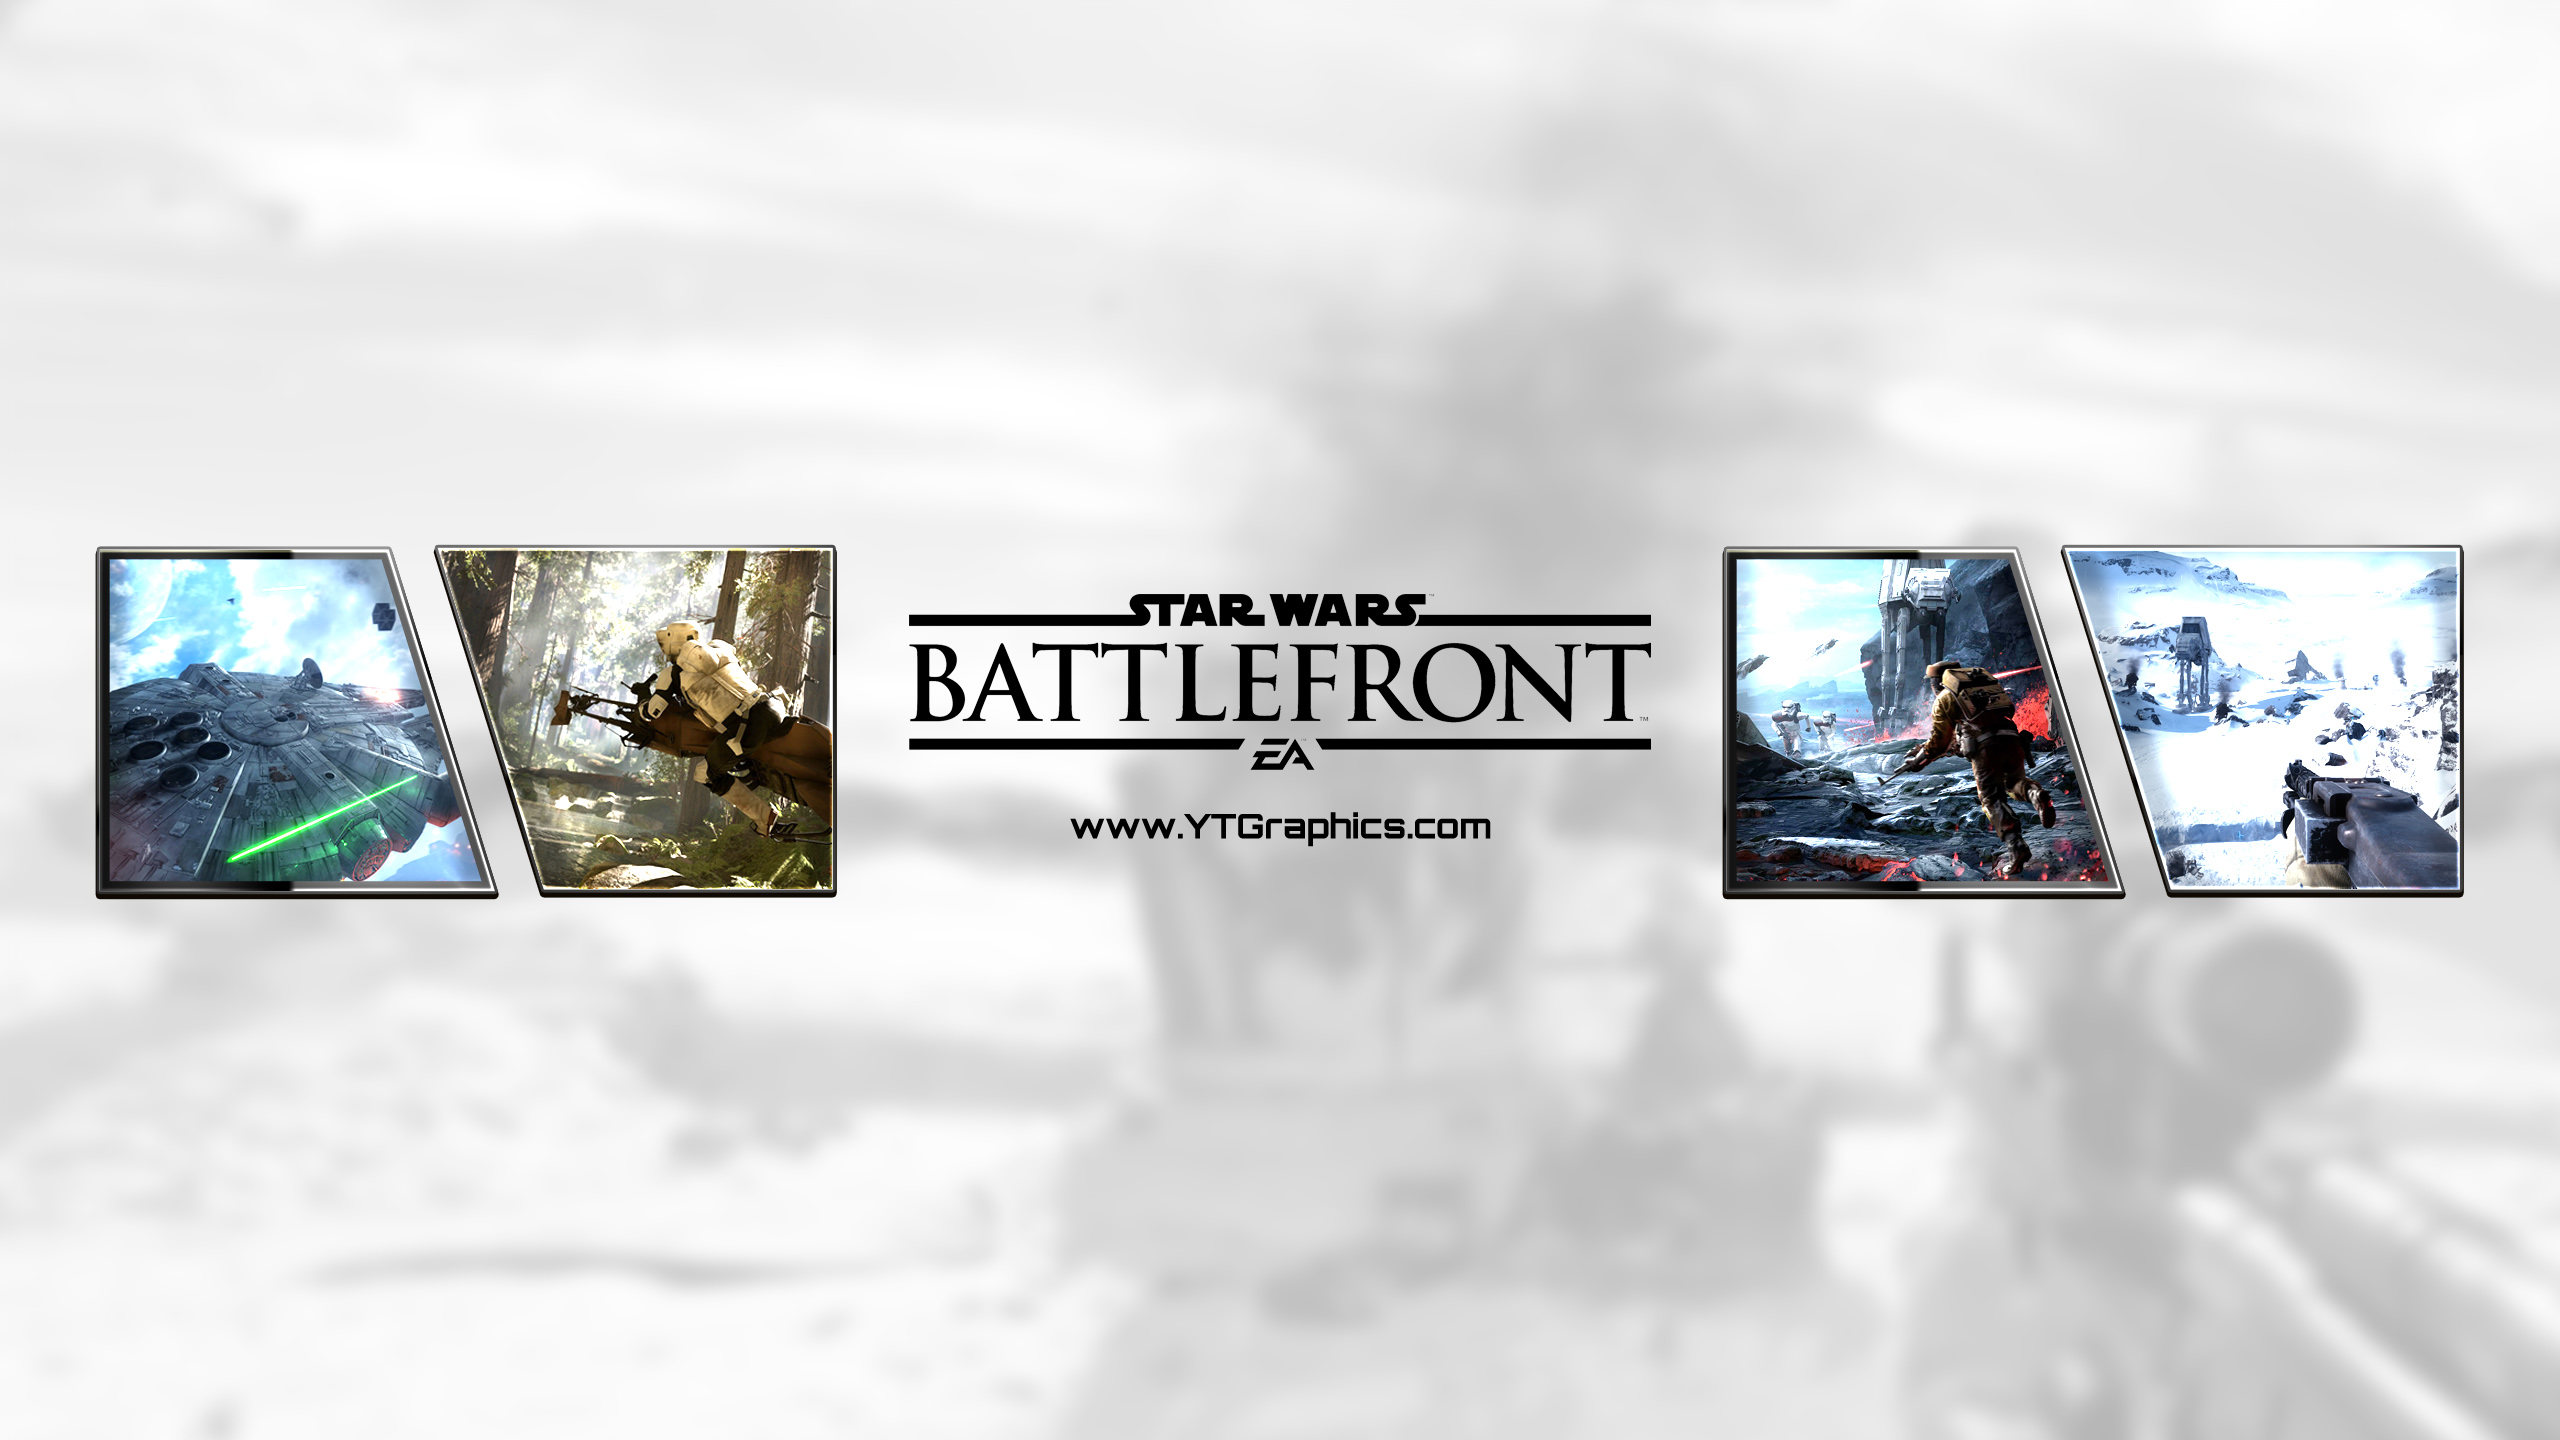 Star Wars Battlefront Youtube Channel Art Banner